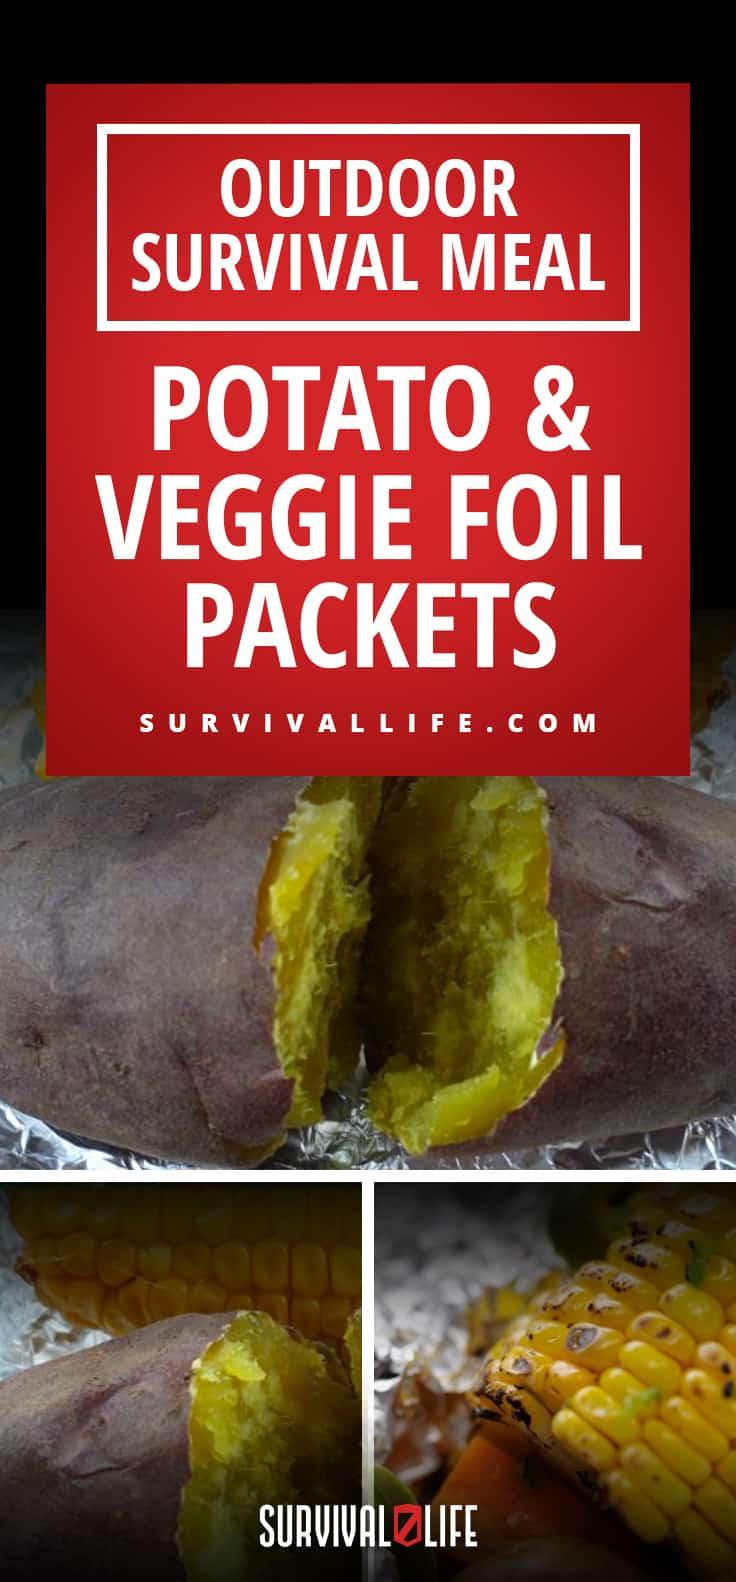 Outdoor Survival Meal: Potato & Veggie Foil Packets